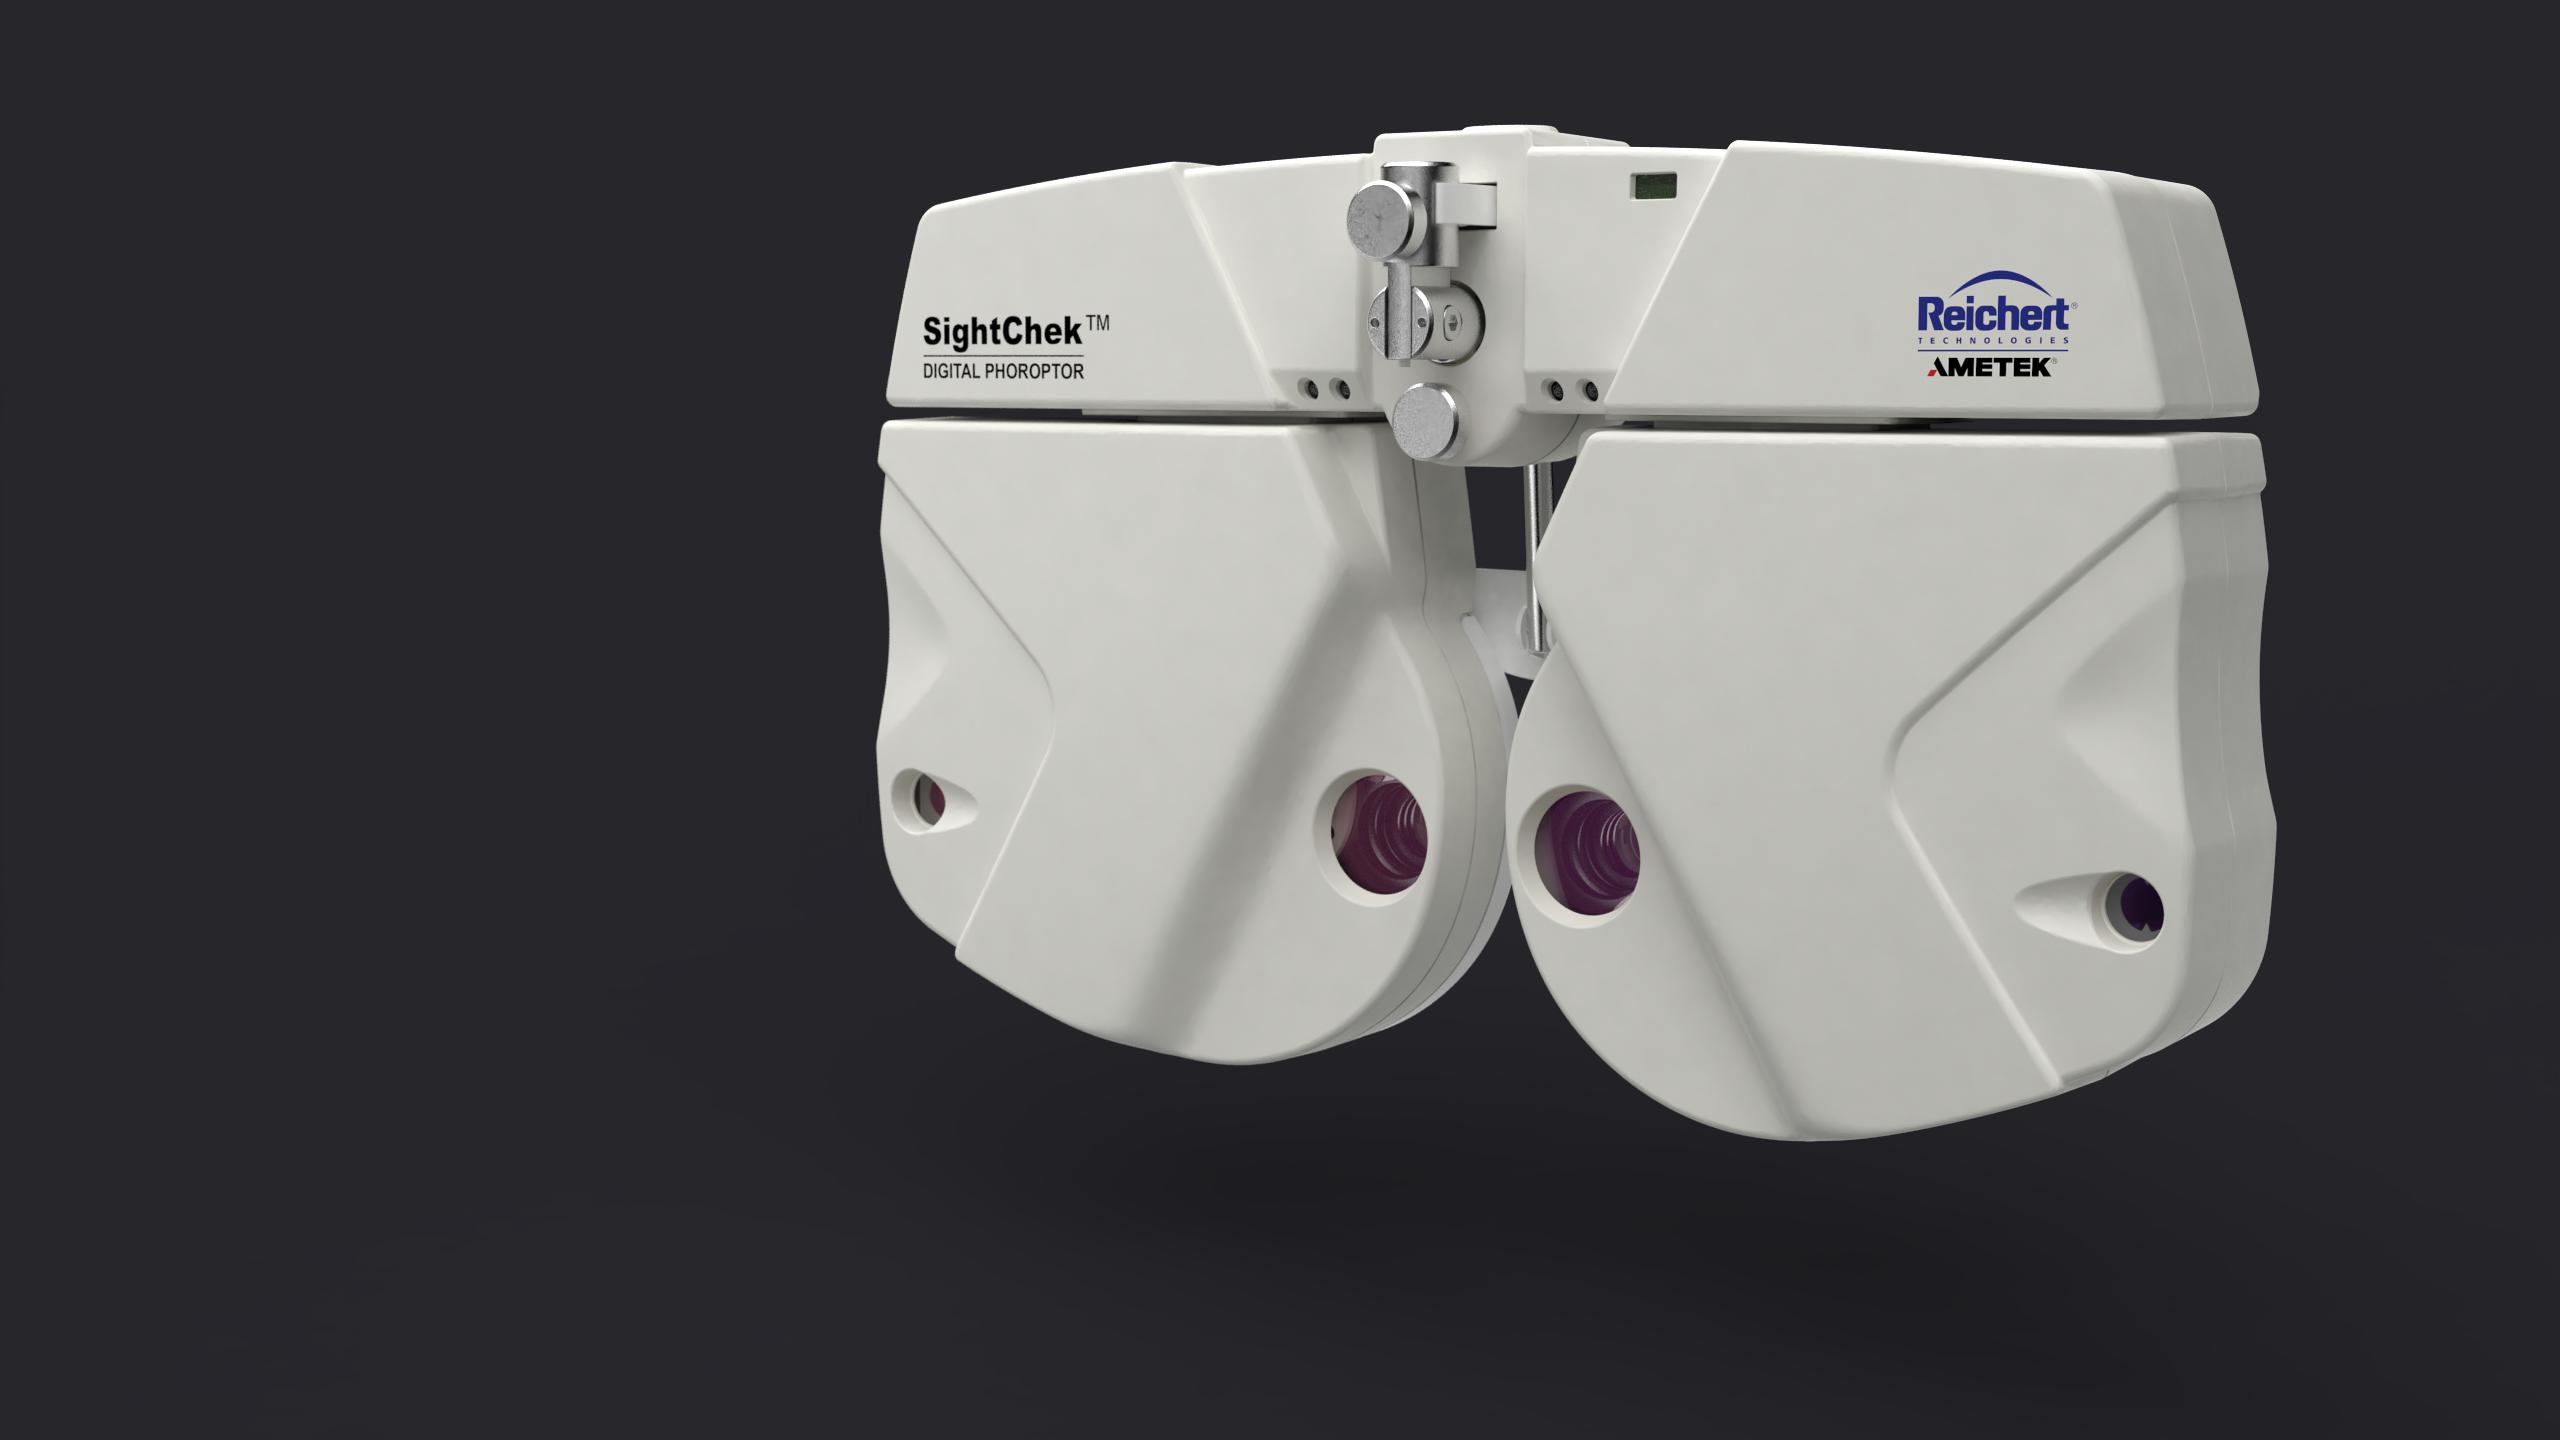 Design of the SightChek™ Digital Phoroptor®